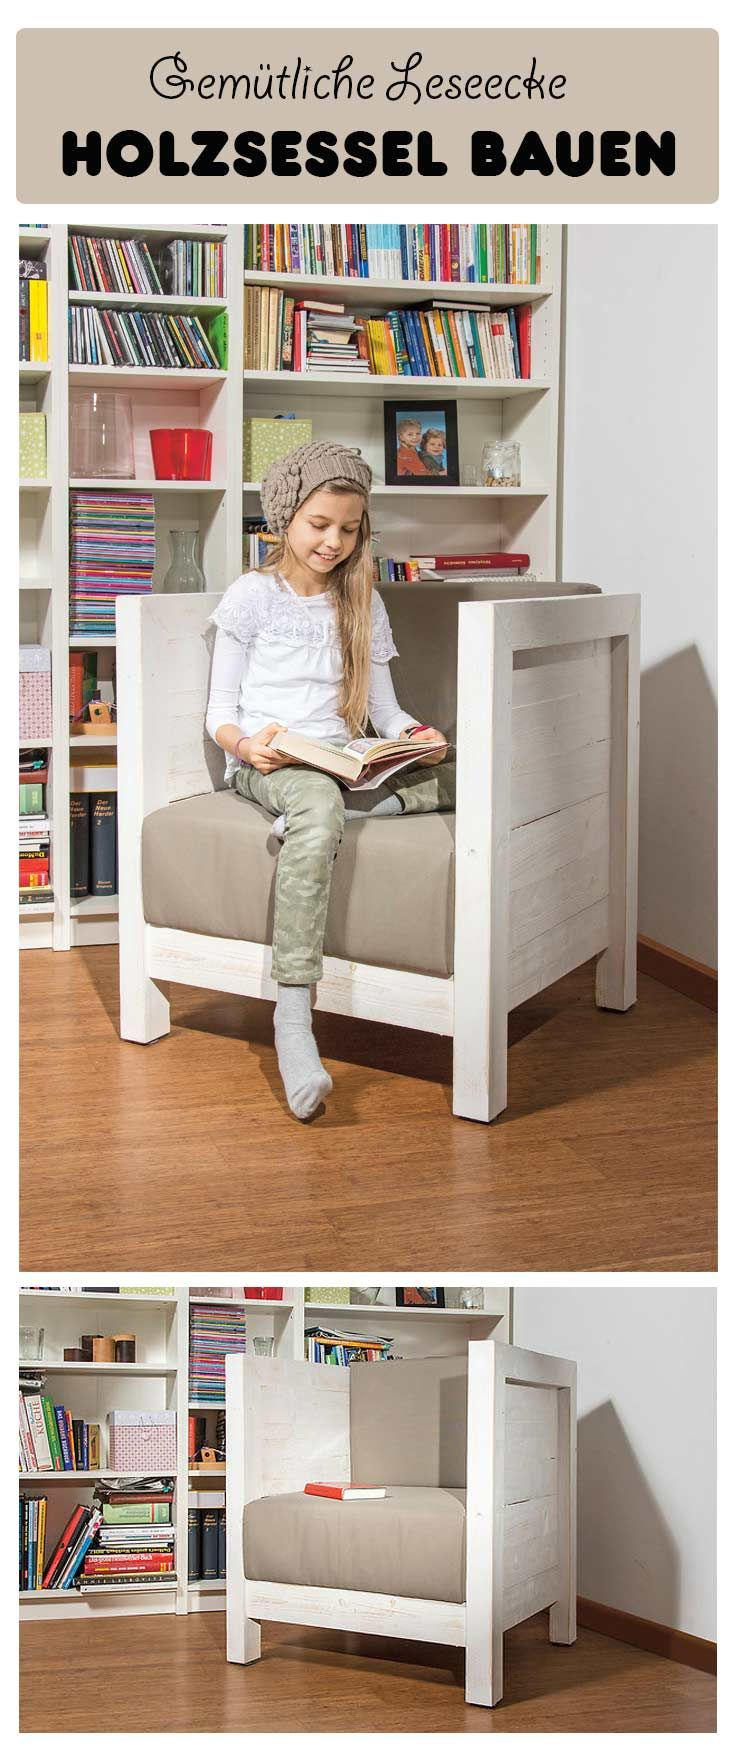 holzsessel selber bauen selbst bauen schritt f r schritt anleitung und schritt f r schritt. Black Bedroom Furniture Sets. Home Design Ideas